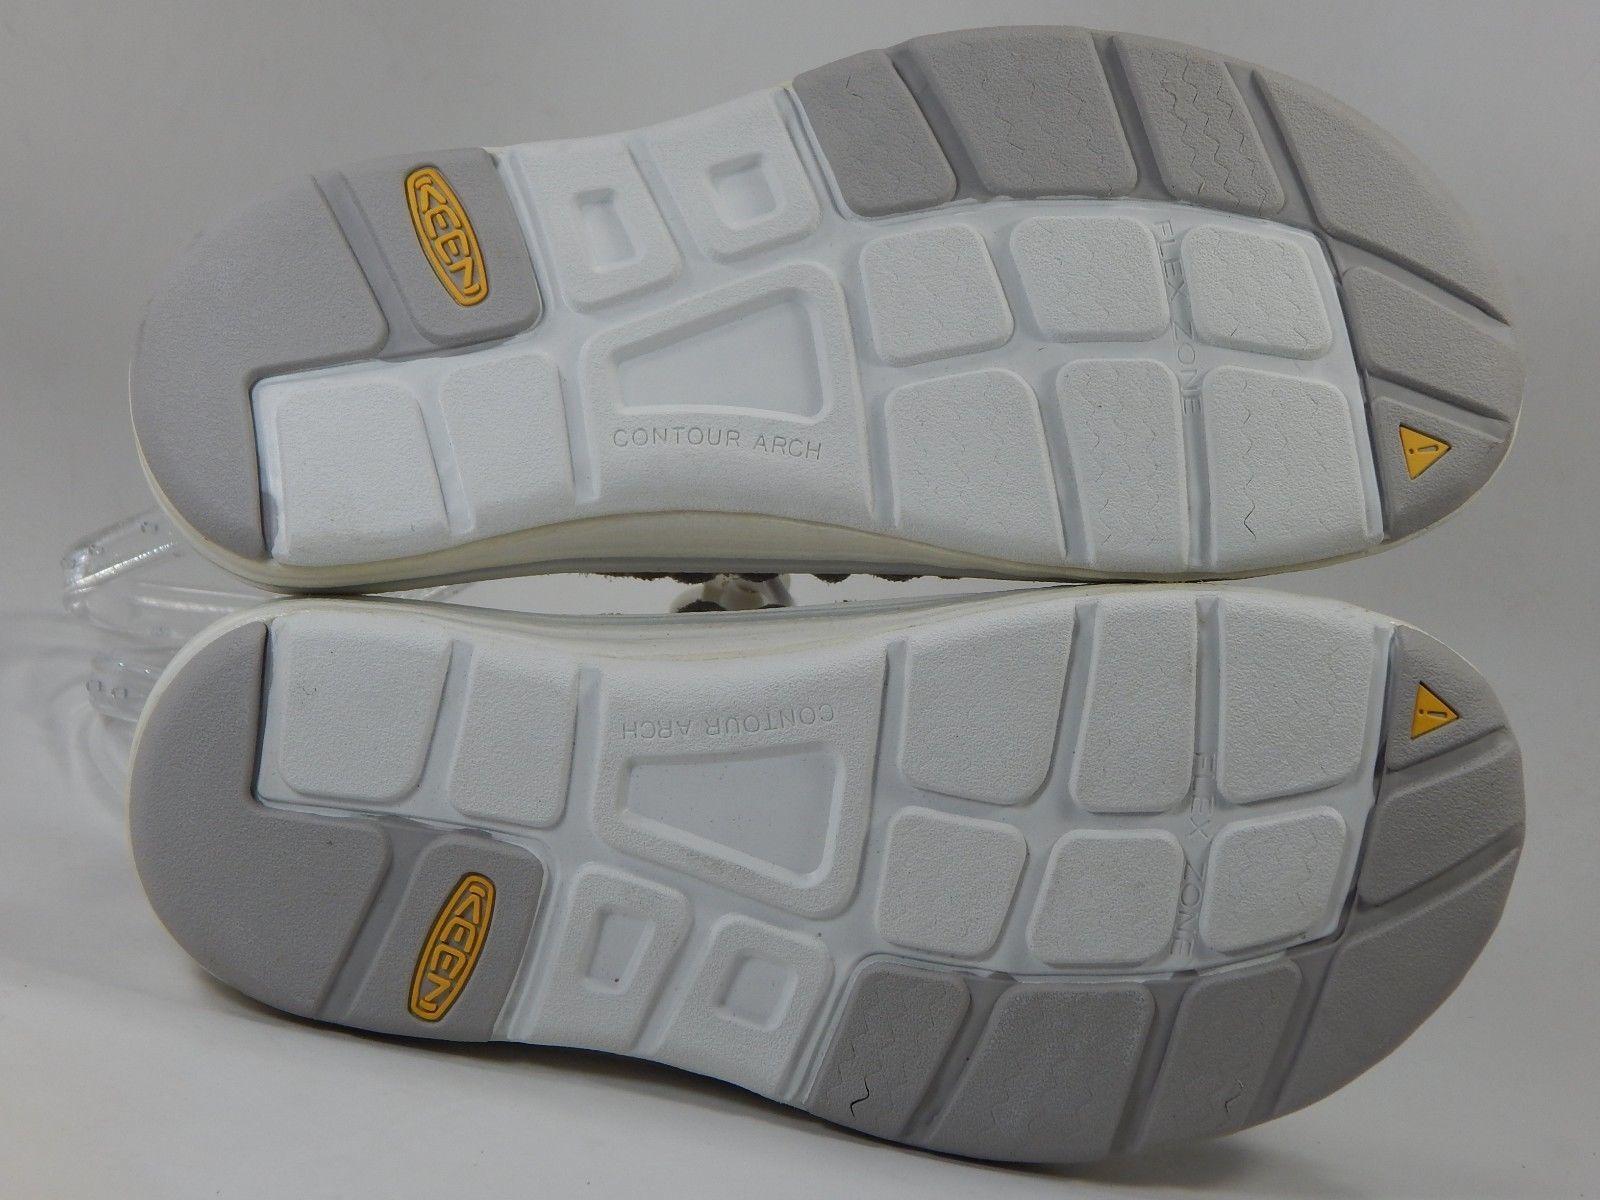 Keen Uneek Leather Women's Sport Sandals Size: US 7 M (B) EU 37.5 Gray / White